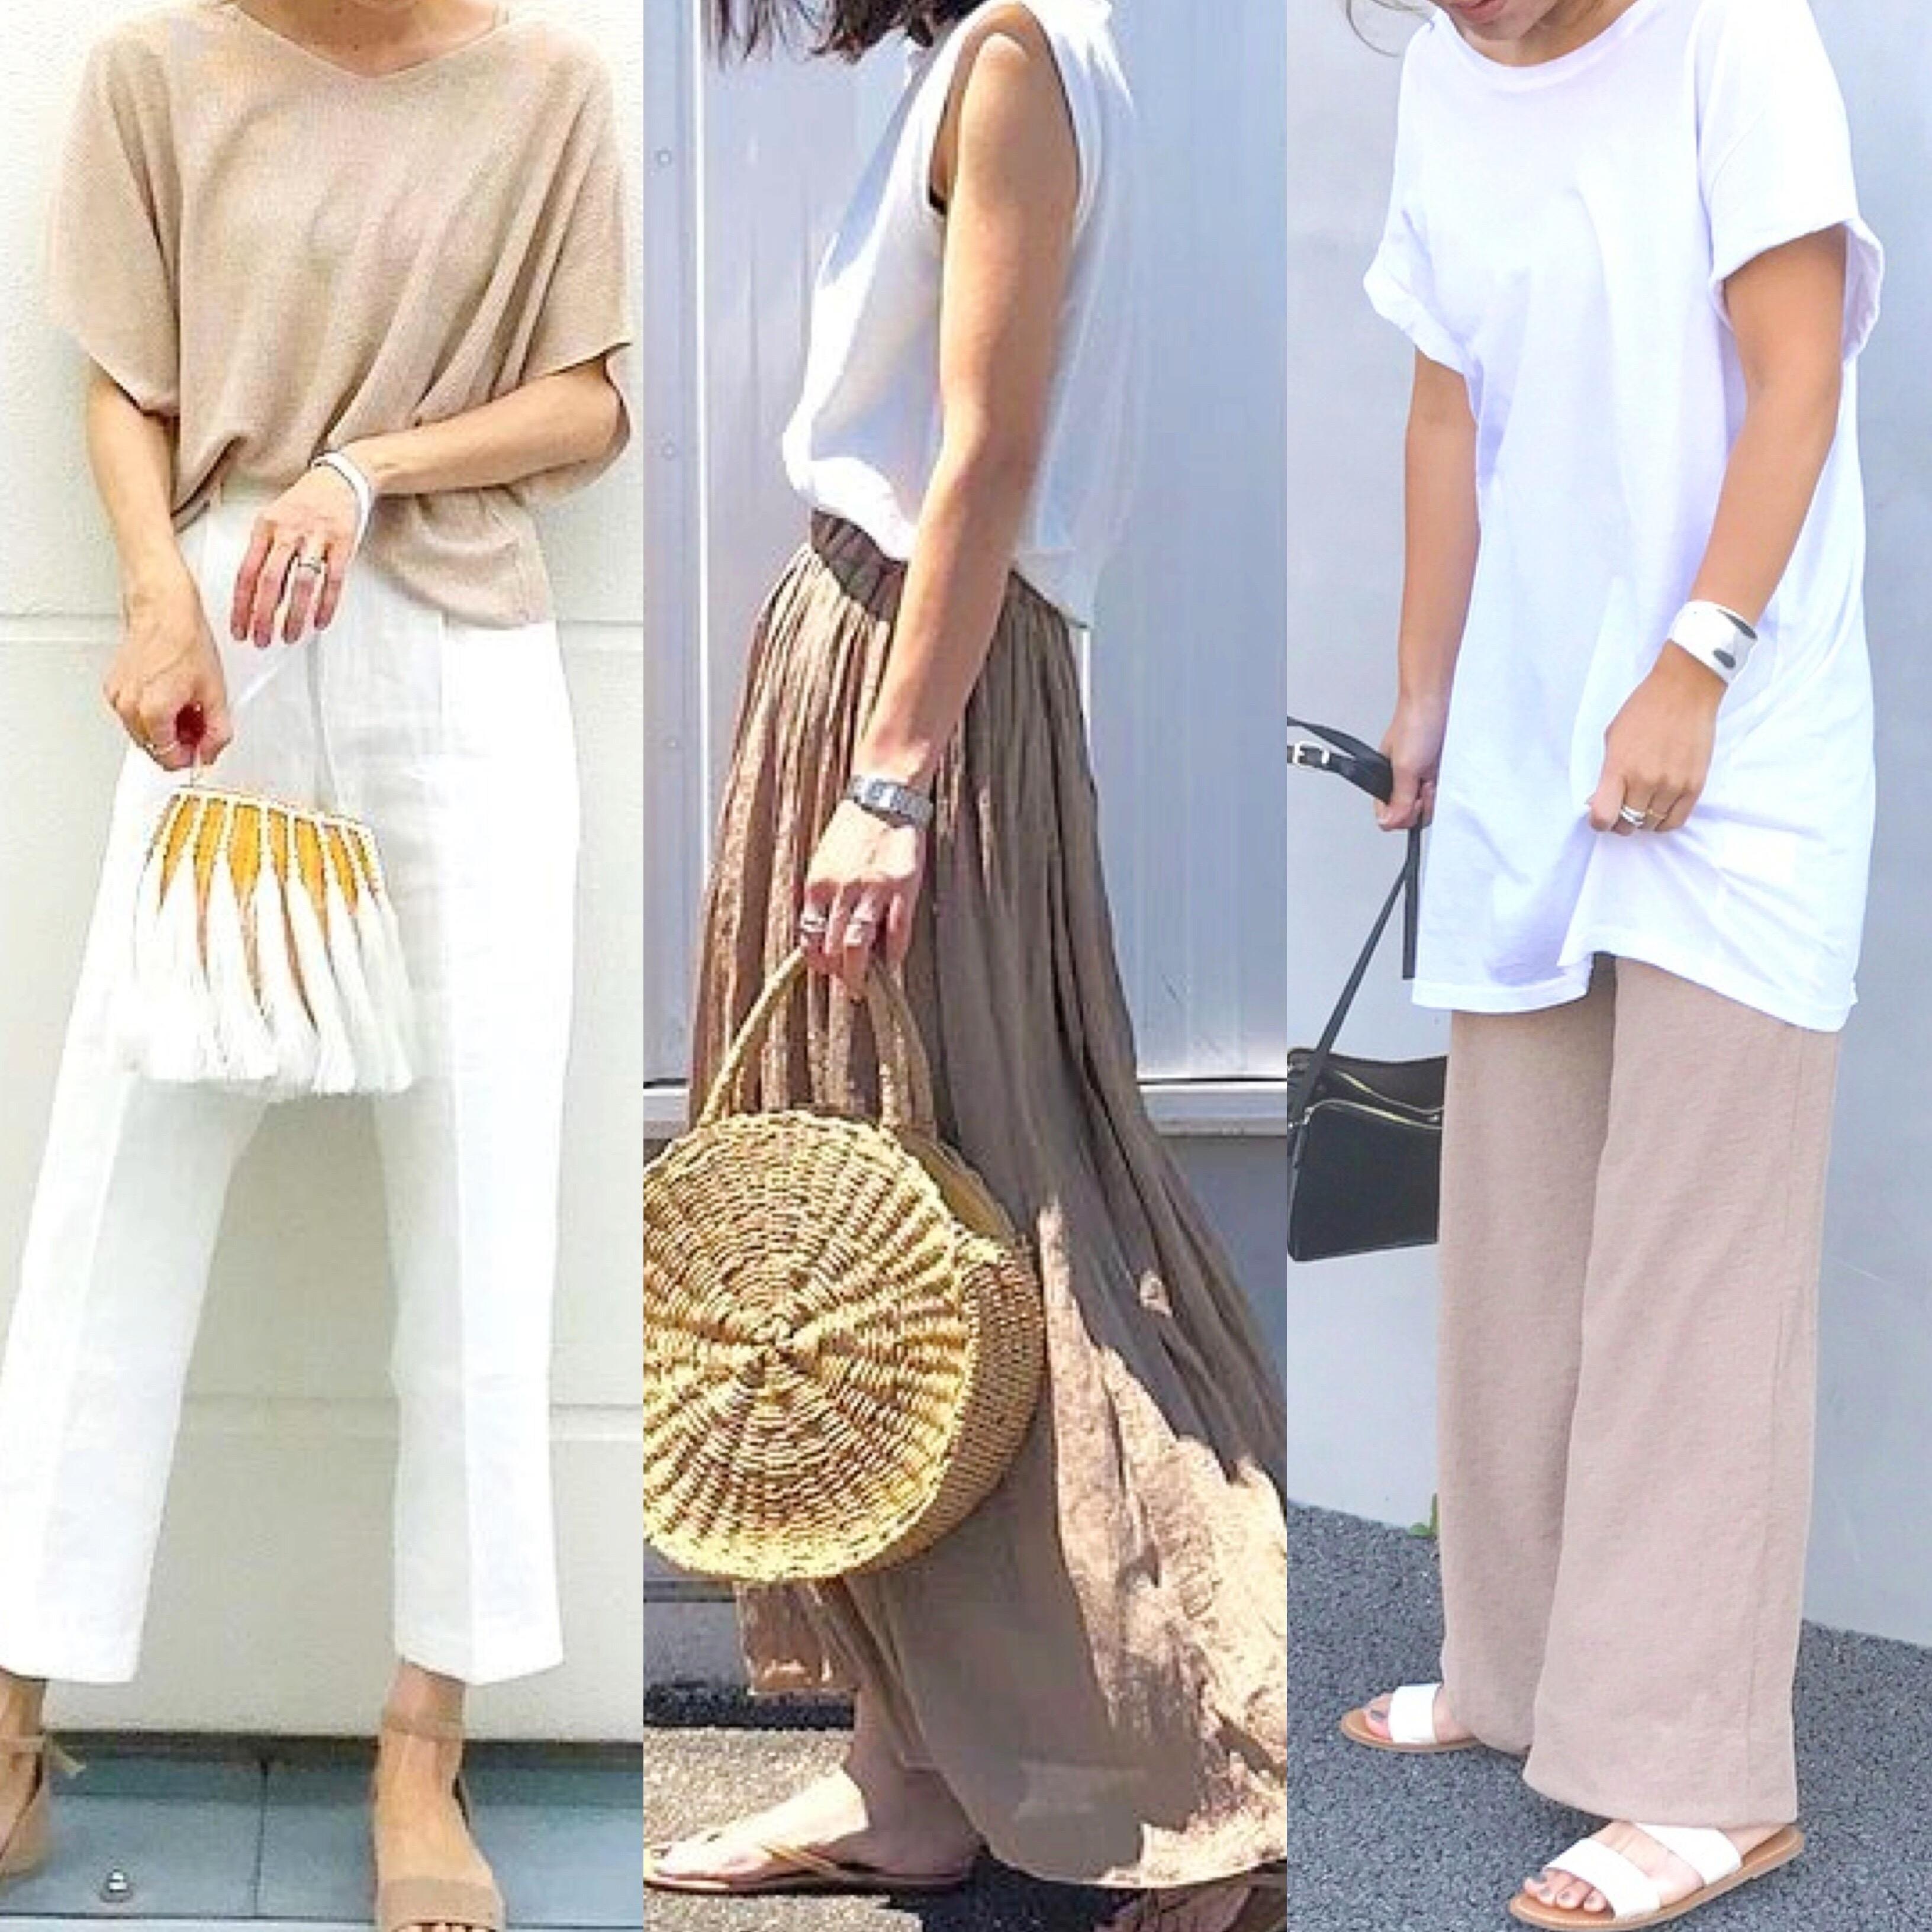 【MINESスナップ】イイ女見え確実な、アラサー女子ファッションって?